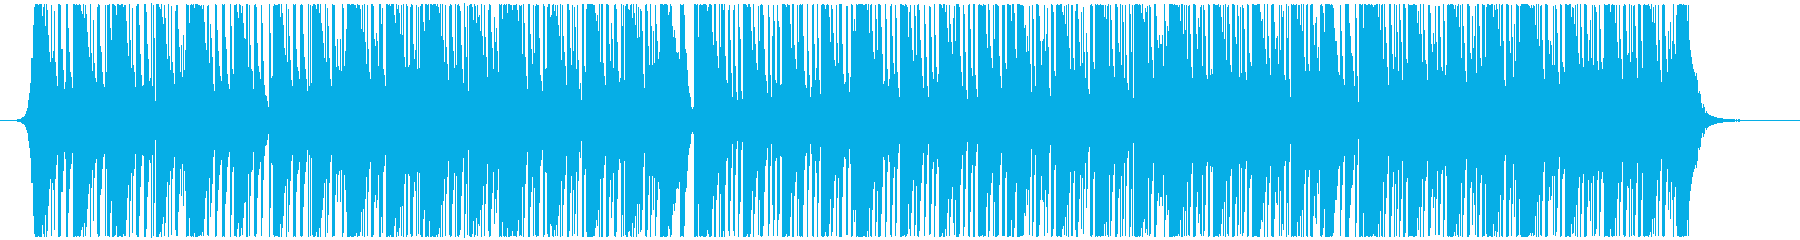 Percussion Musicの再生済みの波形